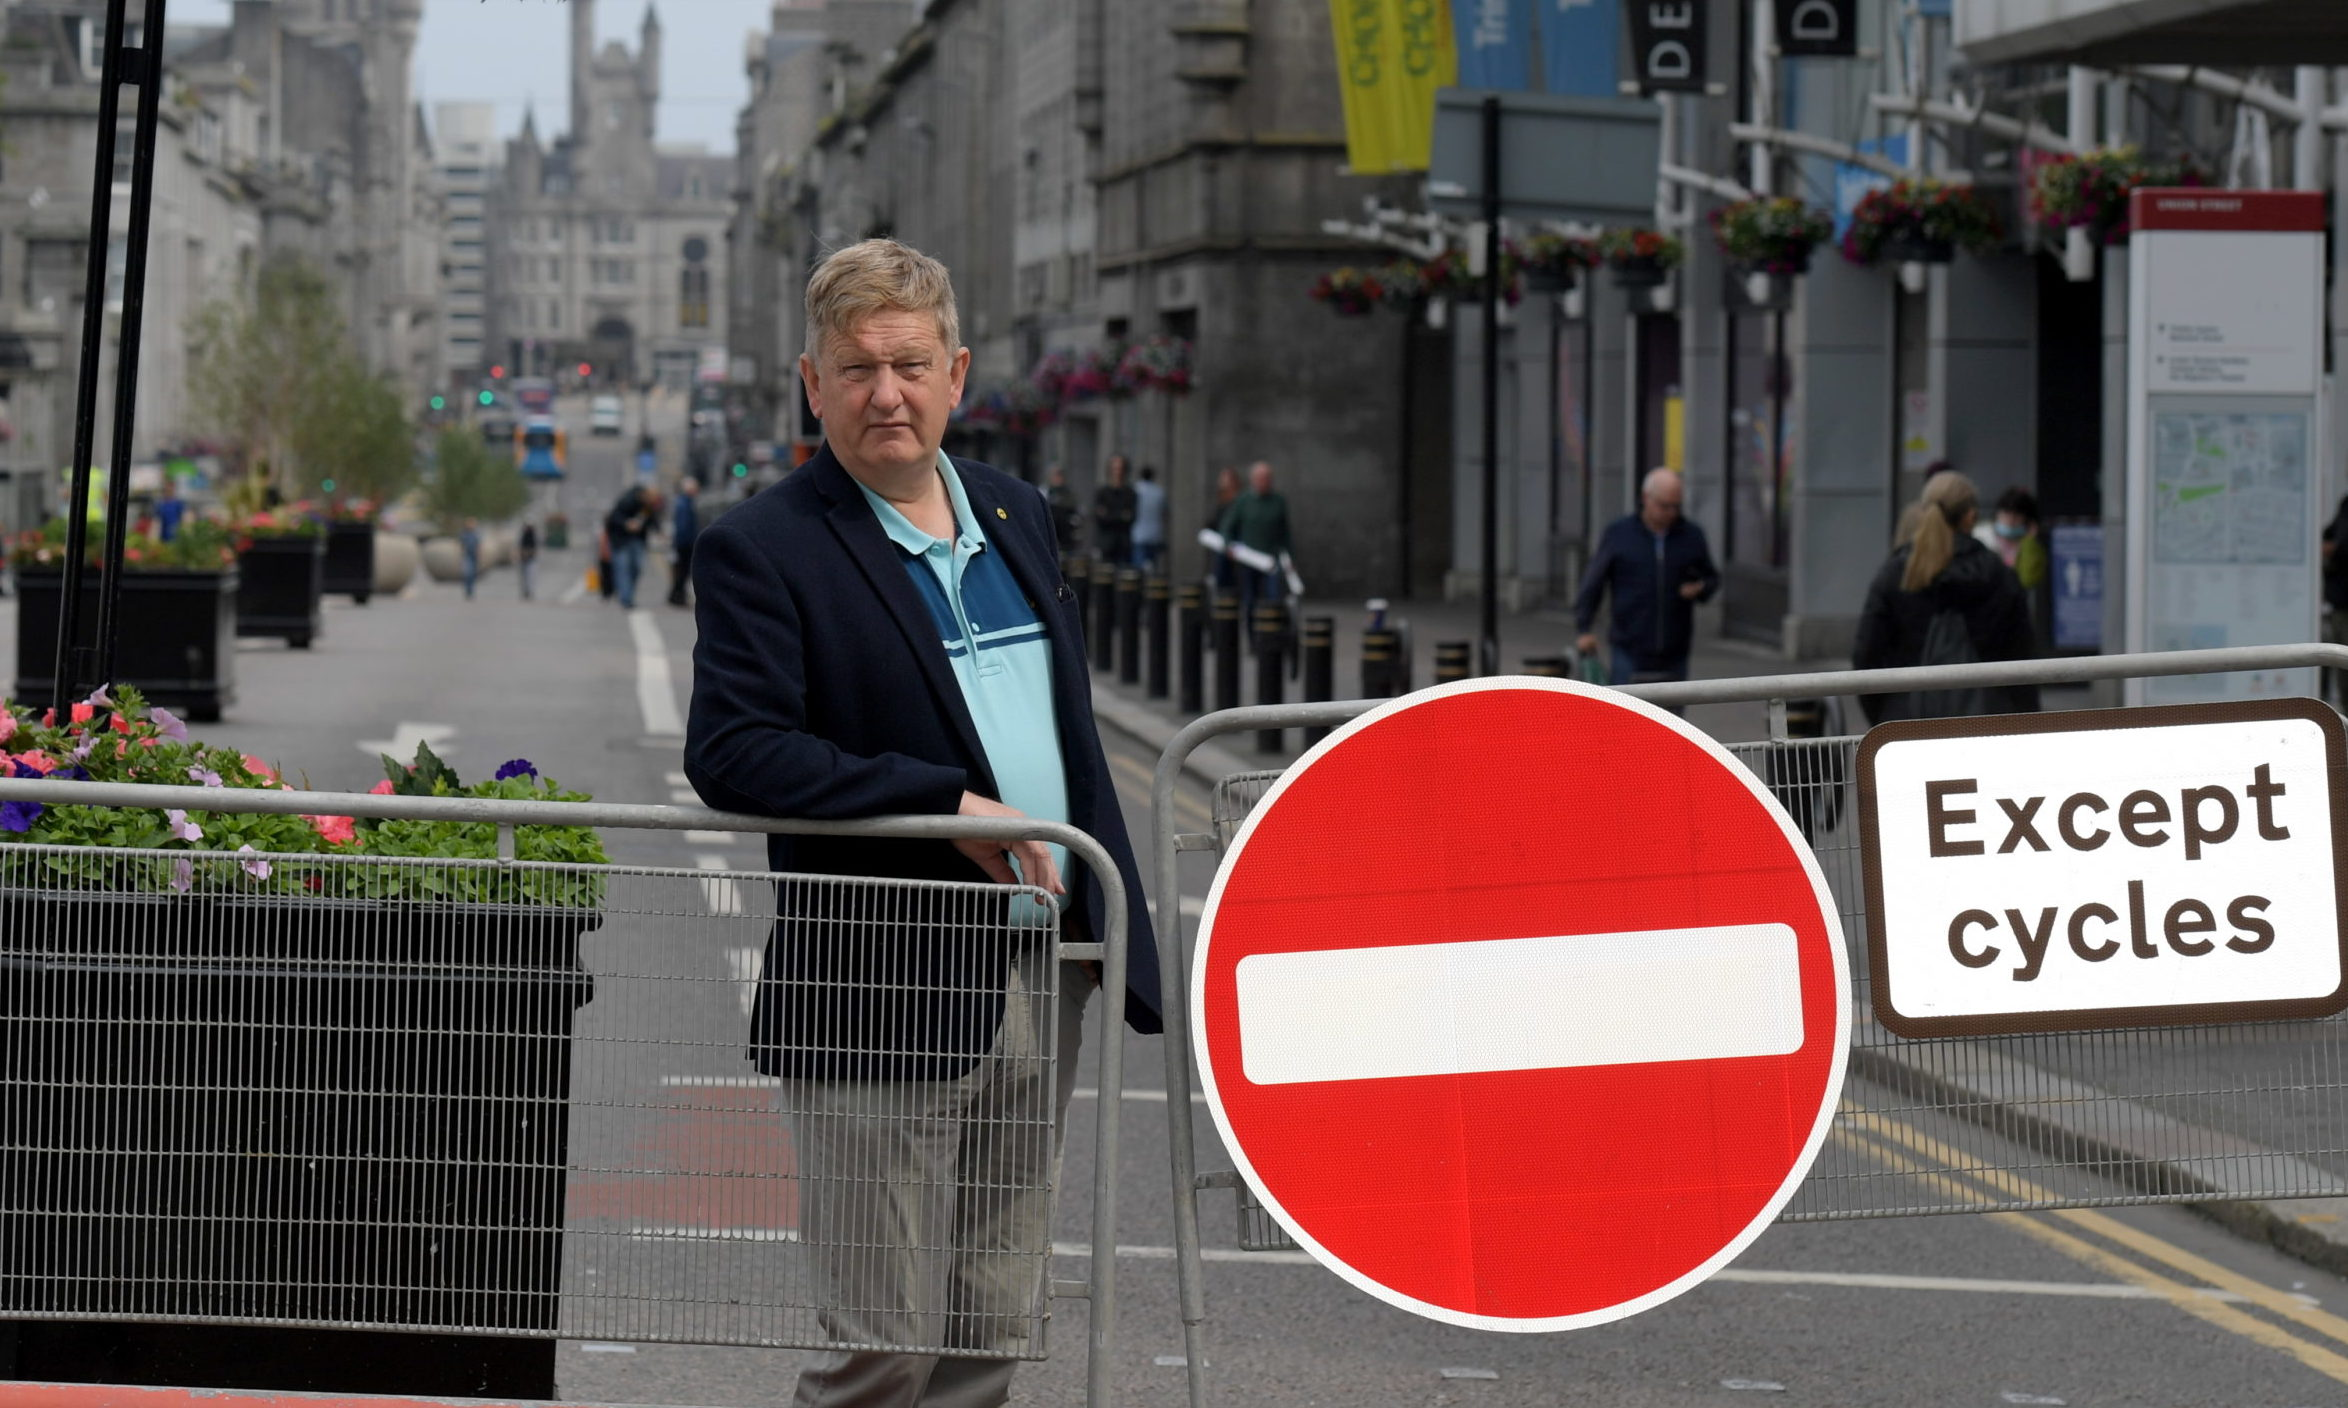 Councillor Alex Nicol